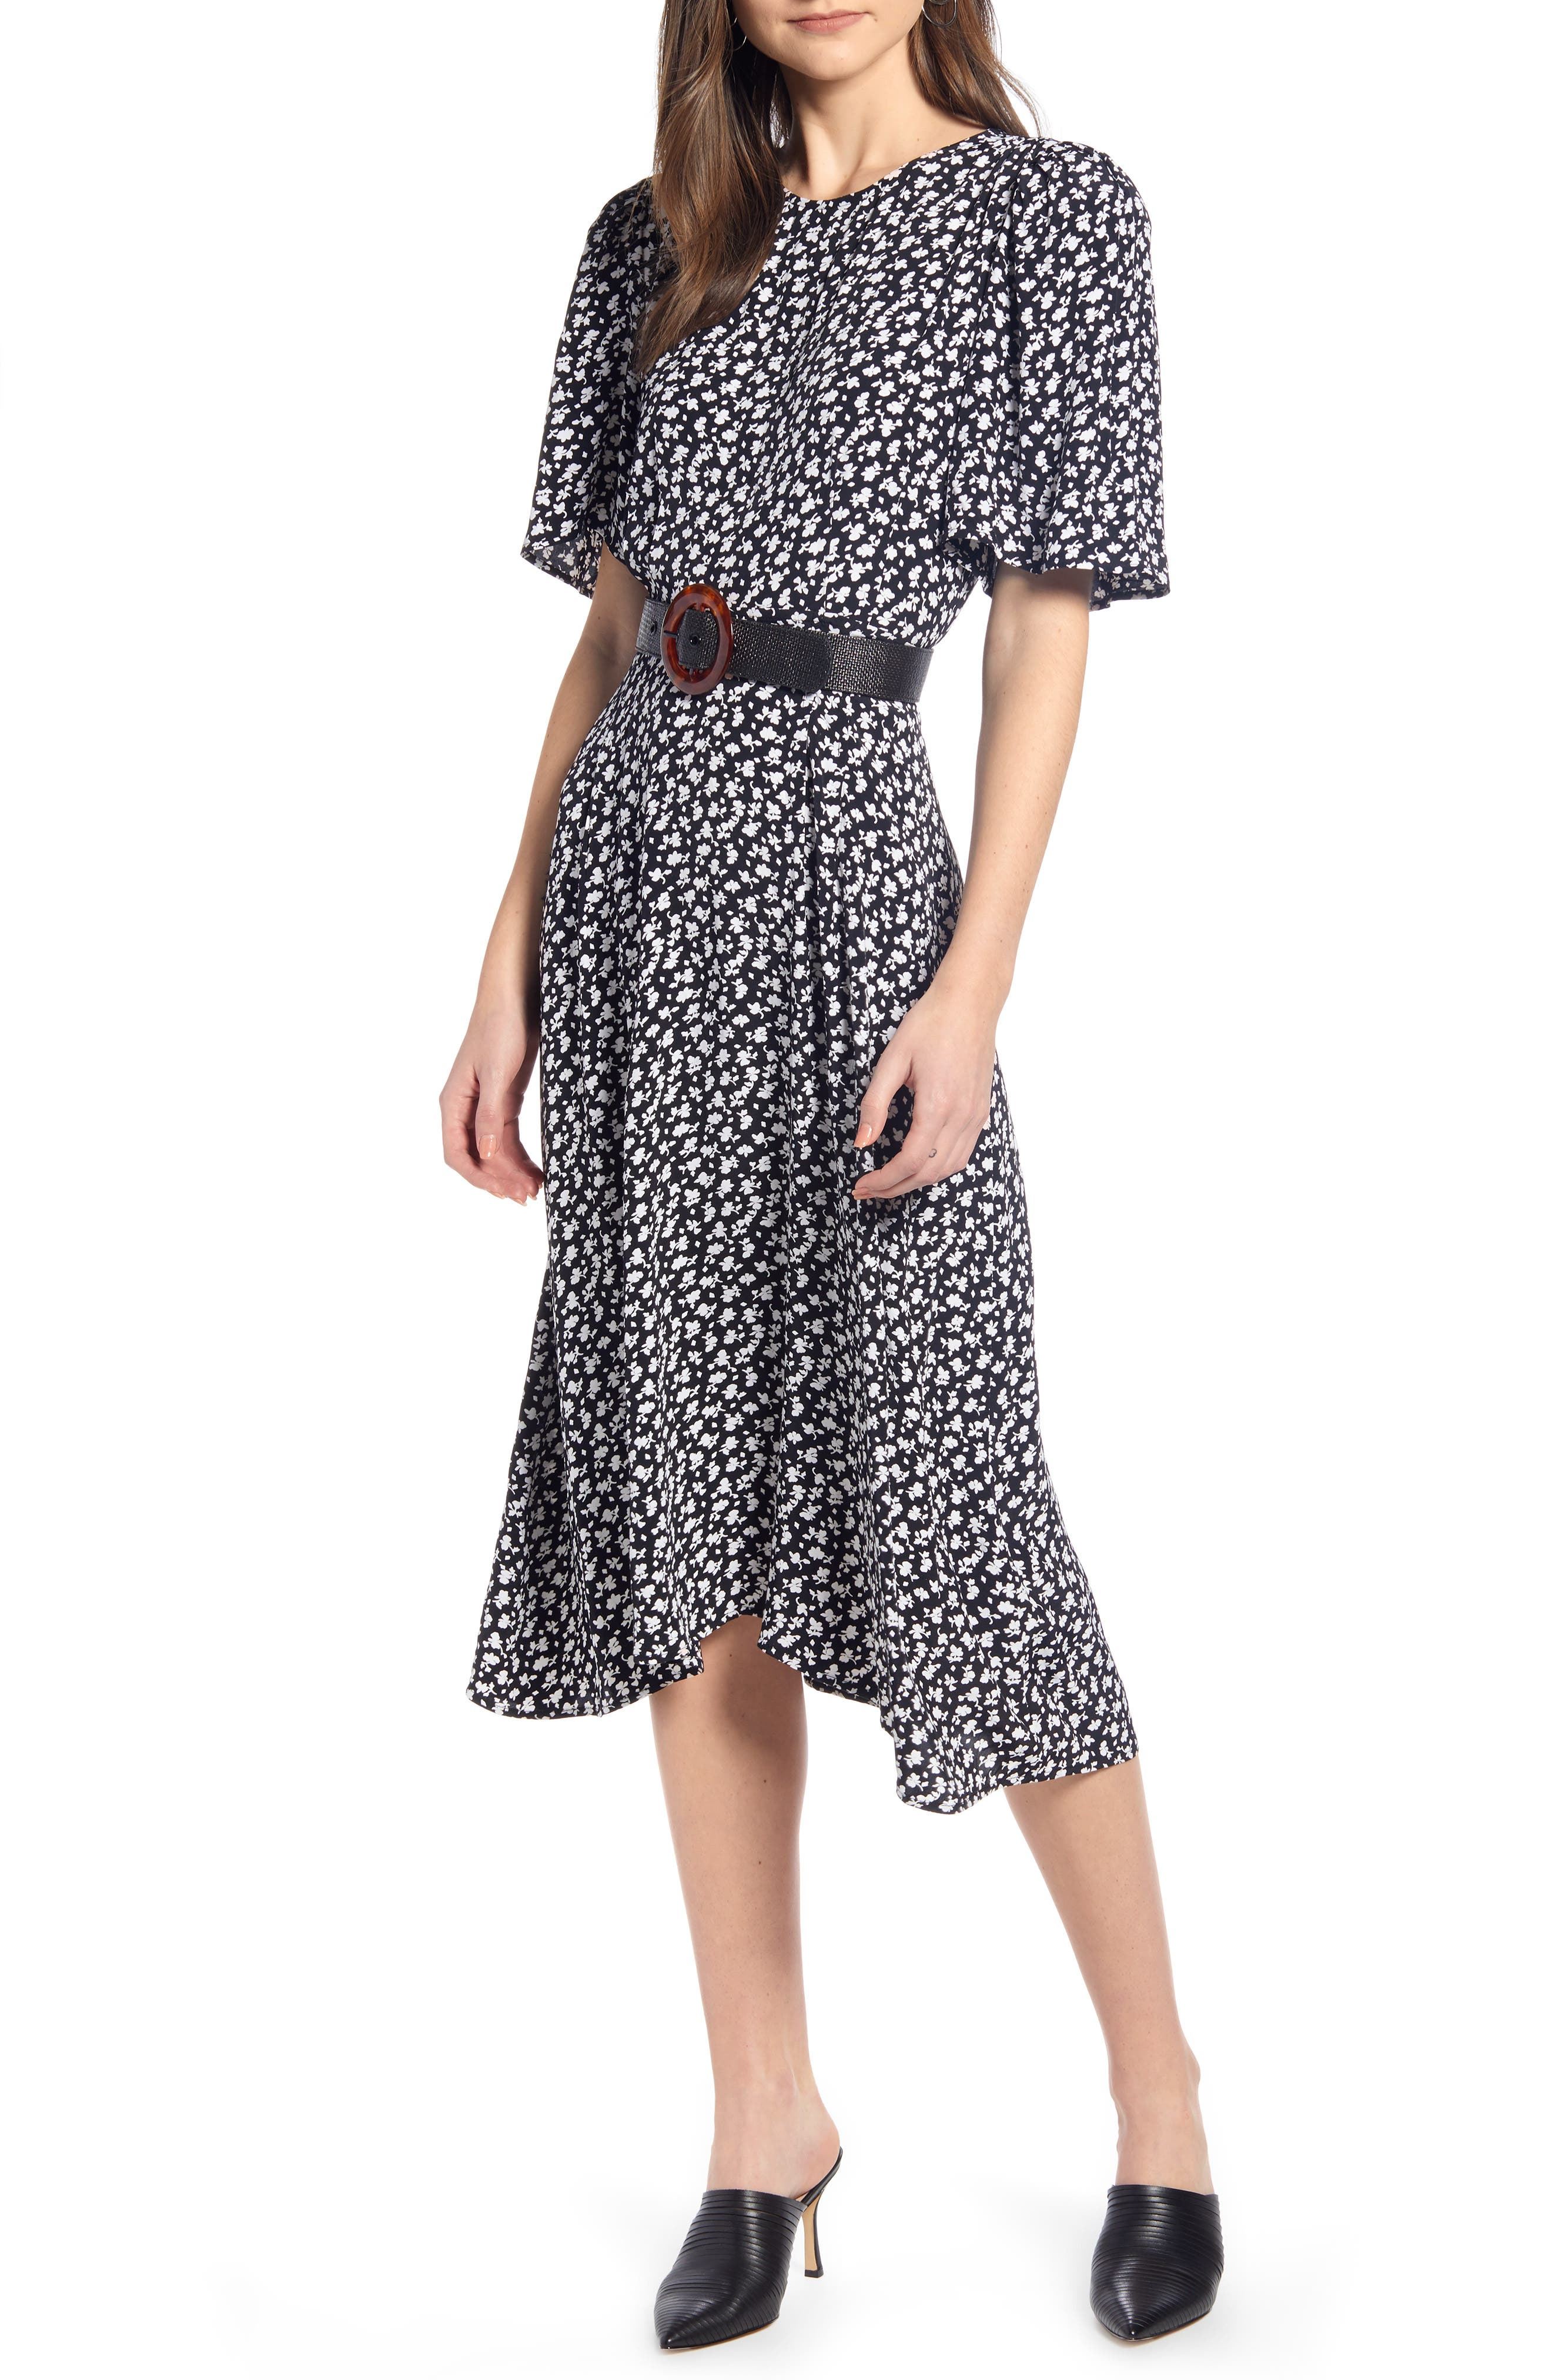 SOMETHING NAVY, Strong Shoulder Floral Print Midi Dress, Main thumbnail 1, color, SN BLACK VINTAGE FLORAL